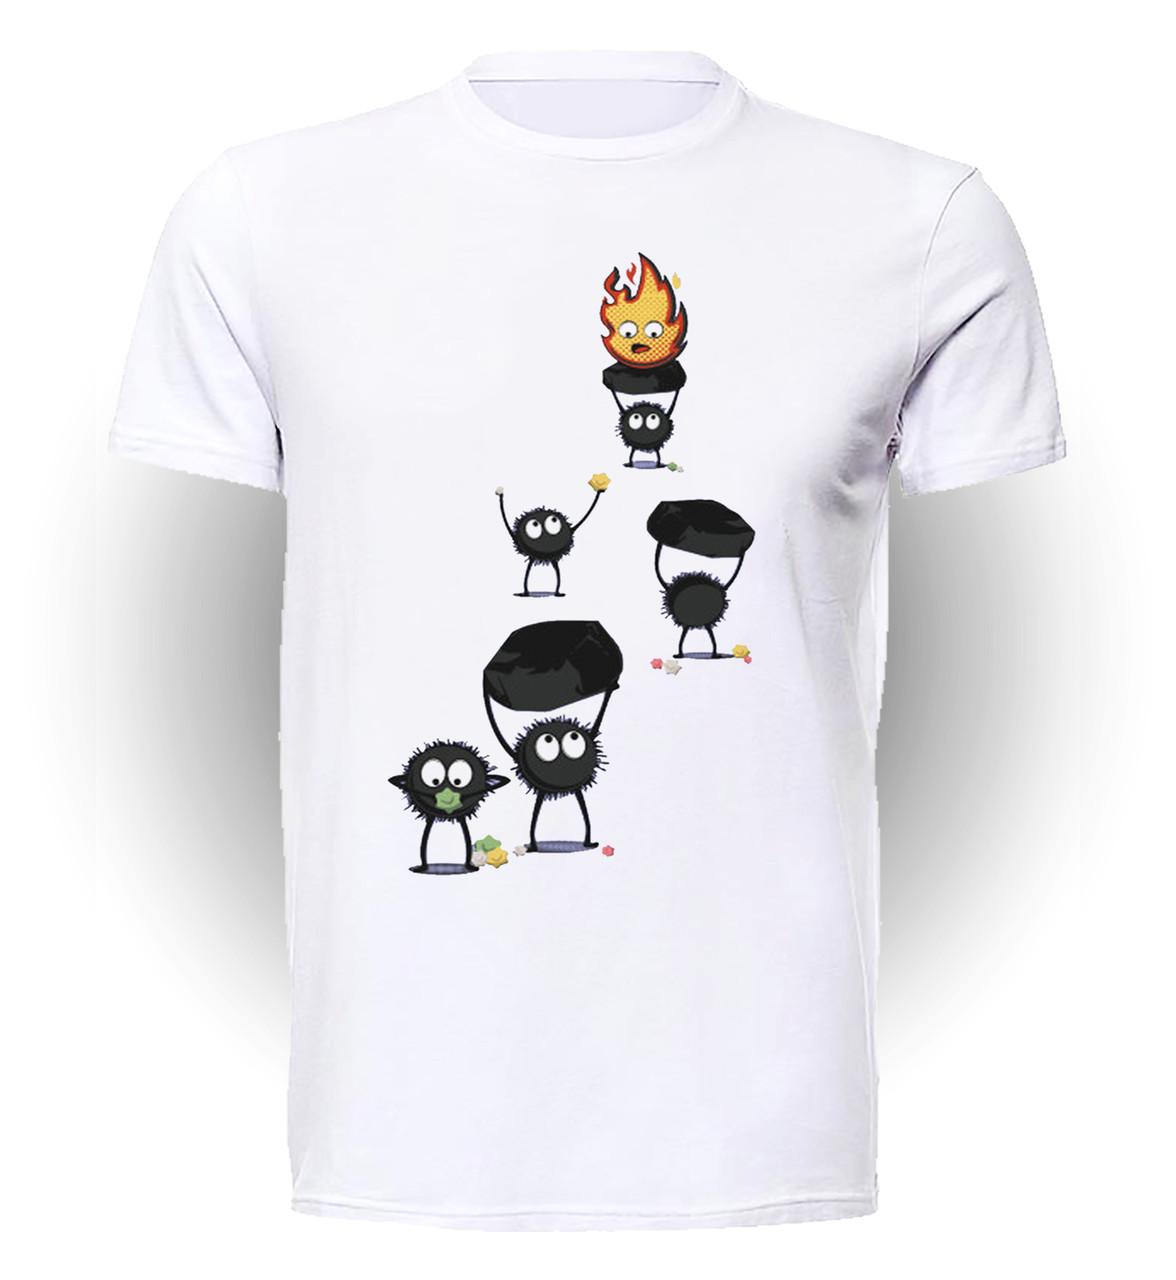 Футболка GeekLand Унесенные Призраками Spirited Away Susuwataris&Flame art SA.01.021